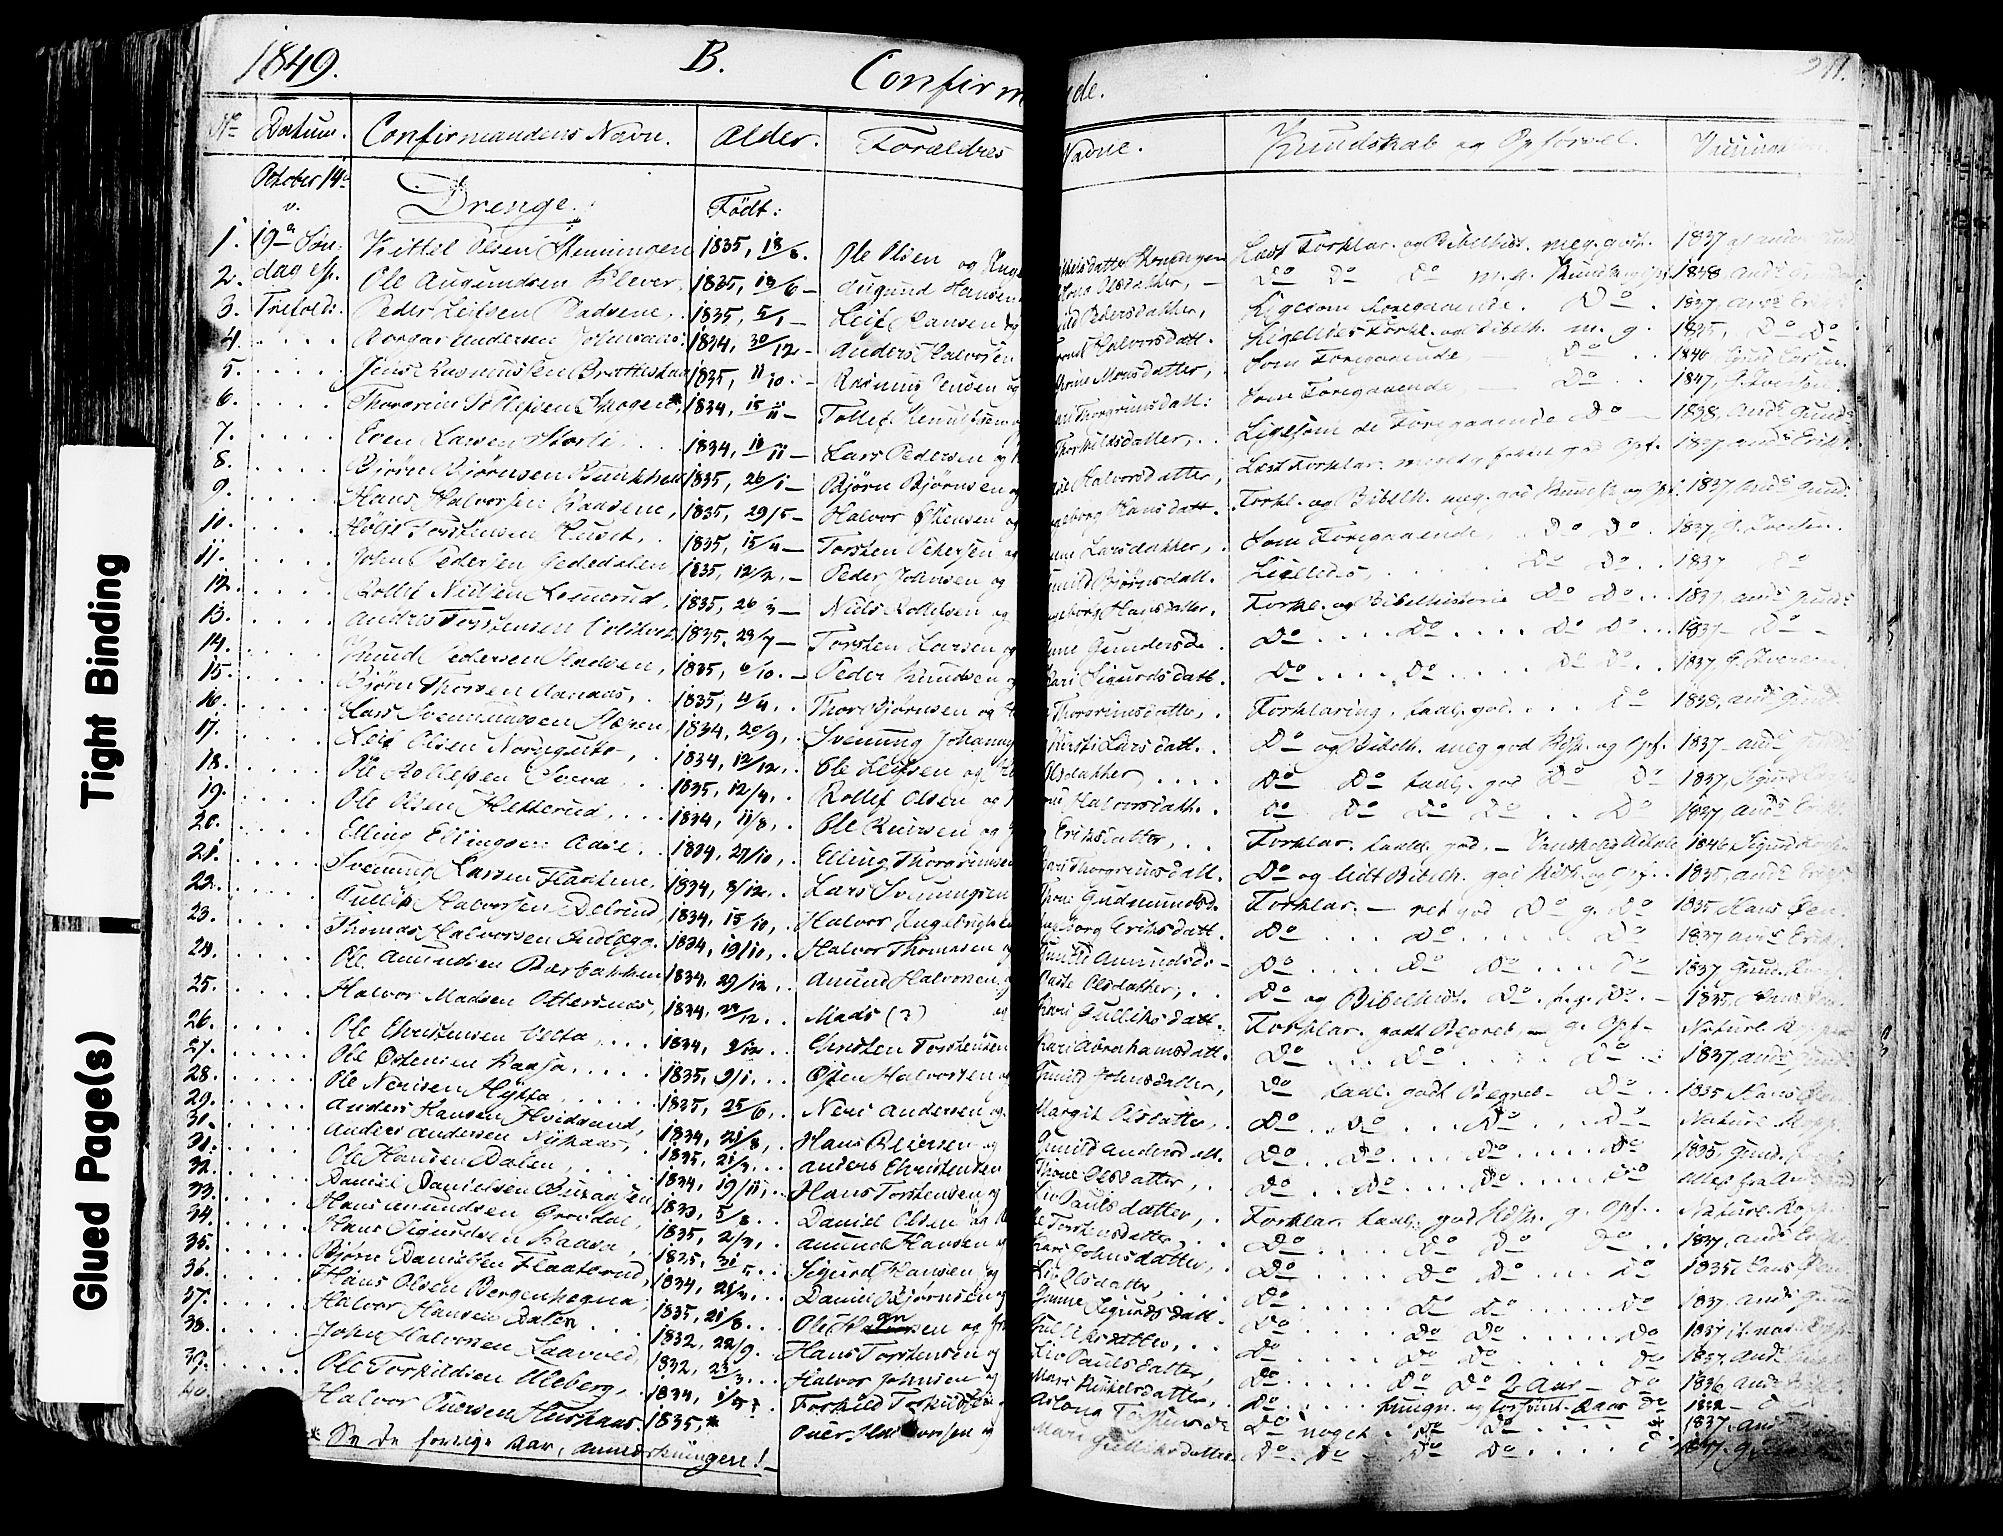 SAKO, Sauherad kirkebøker, F/Fa/L0006: Ministerialbok nr. I 6, 1827-1850, s. 211